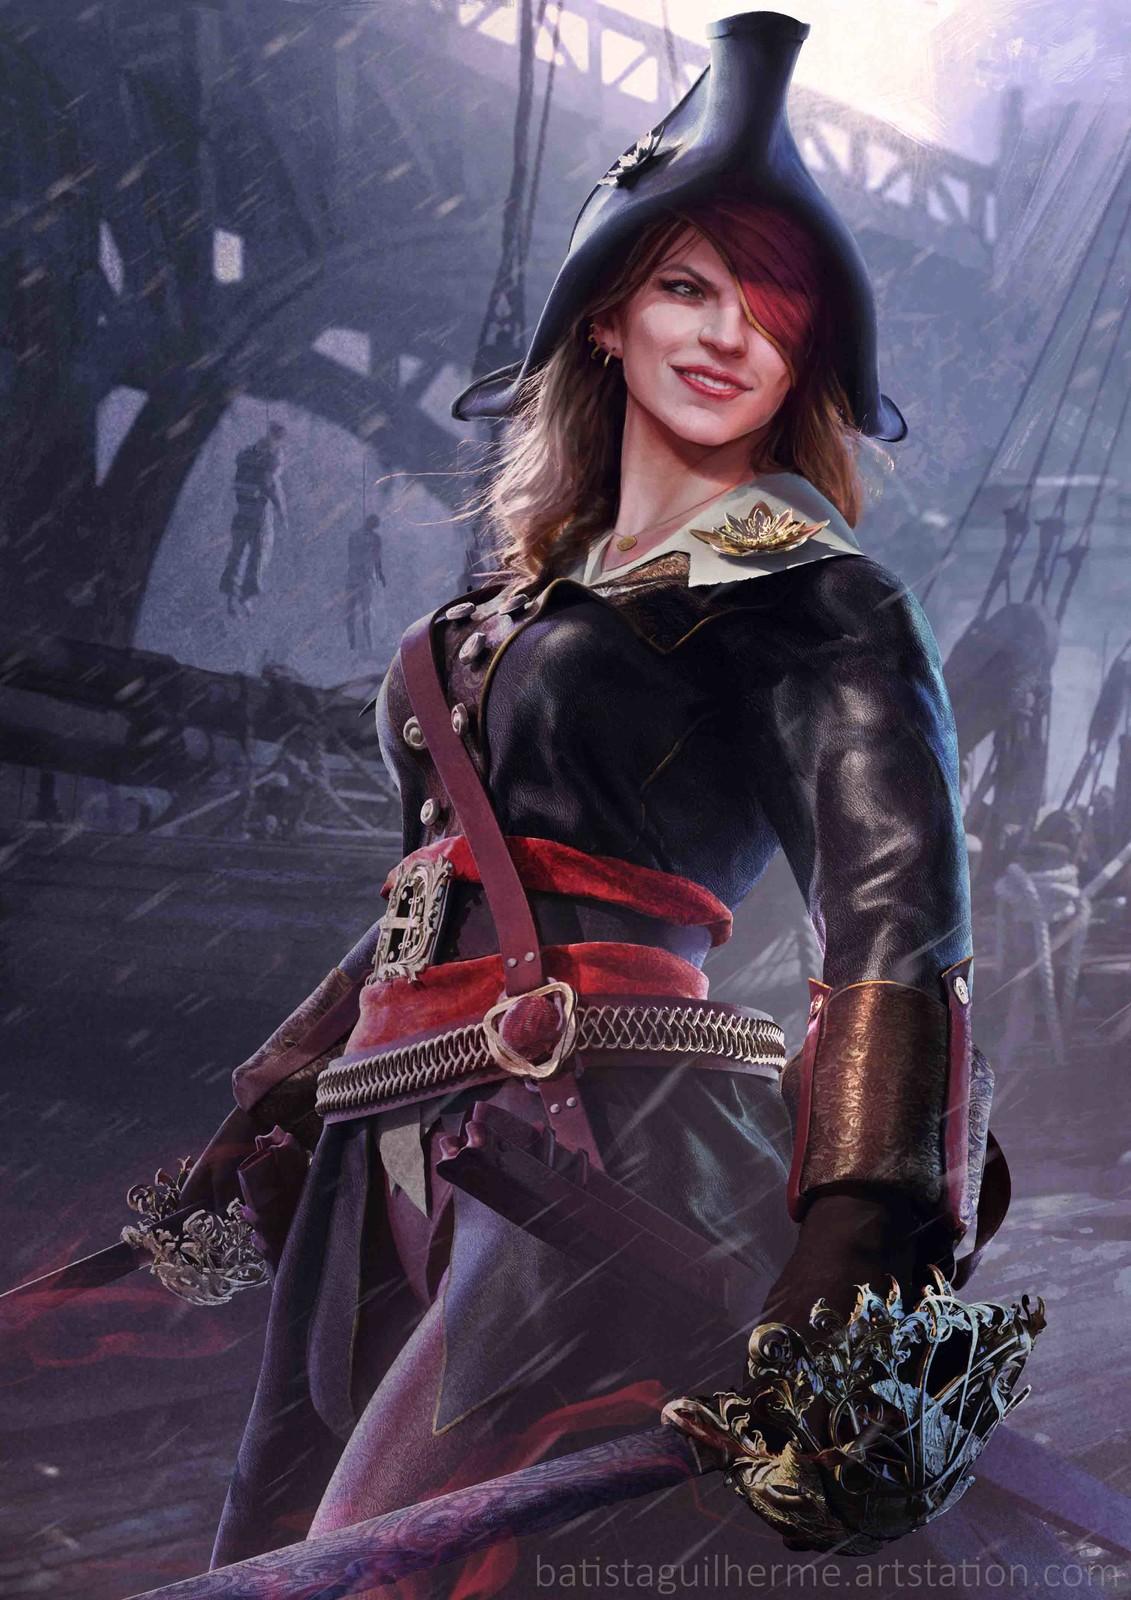 Liana, The Pirate